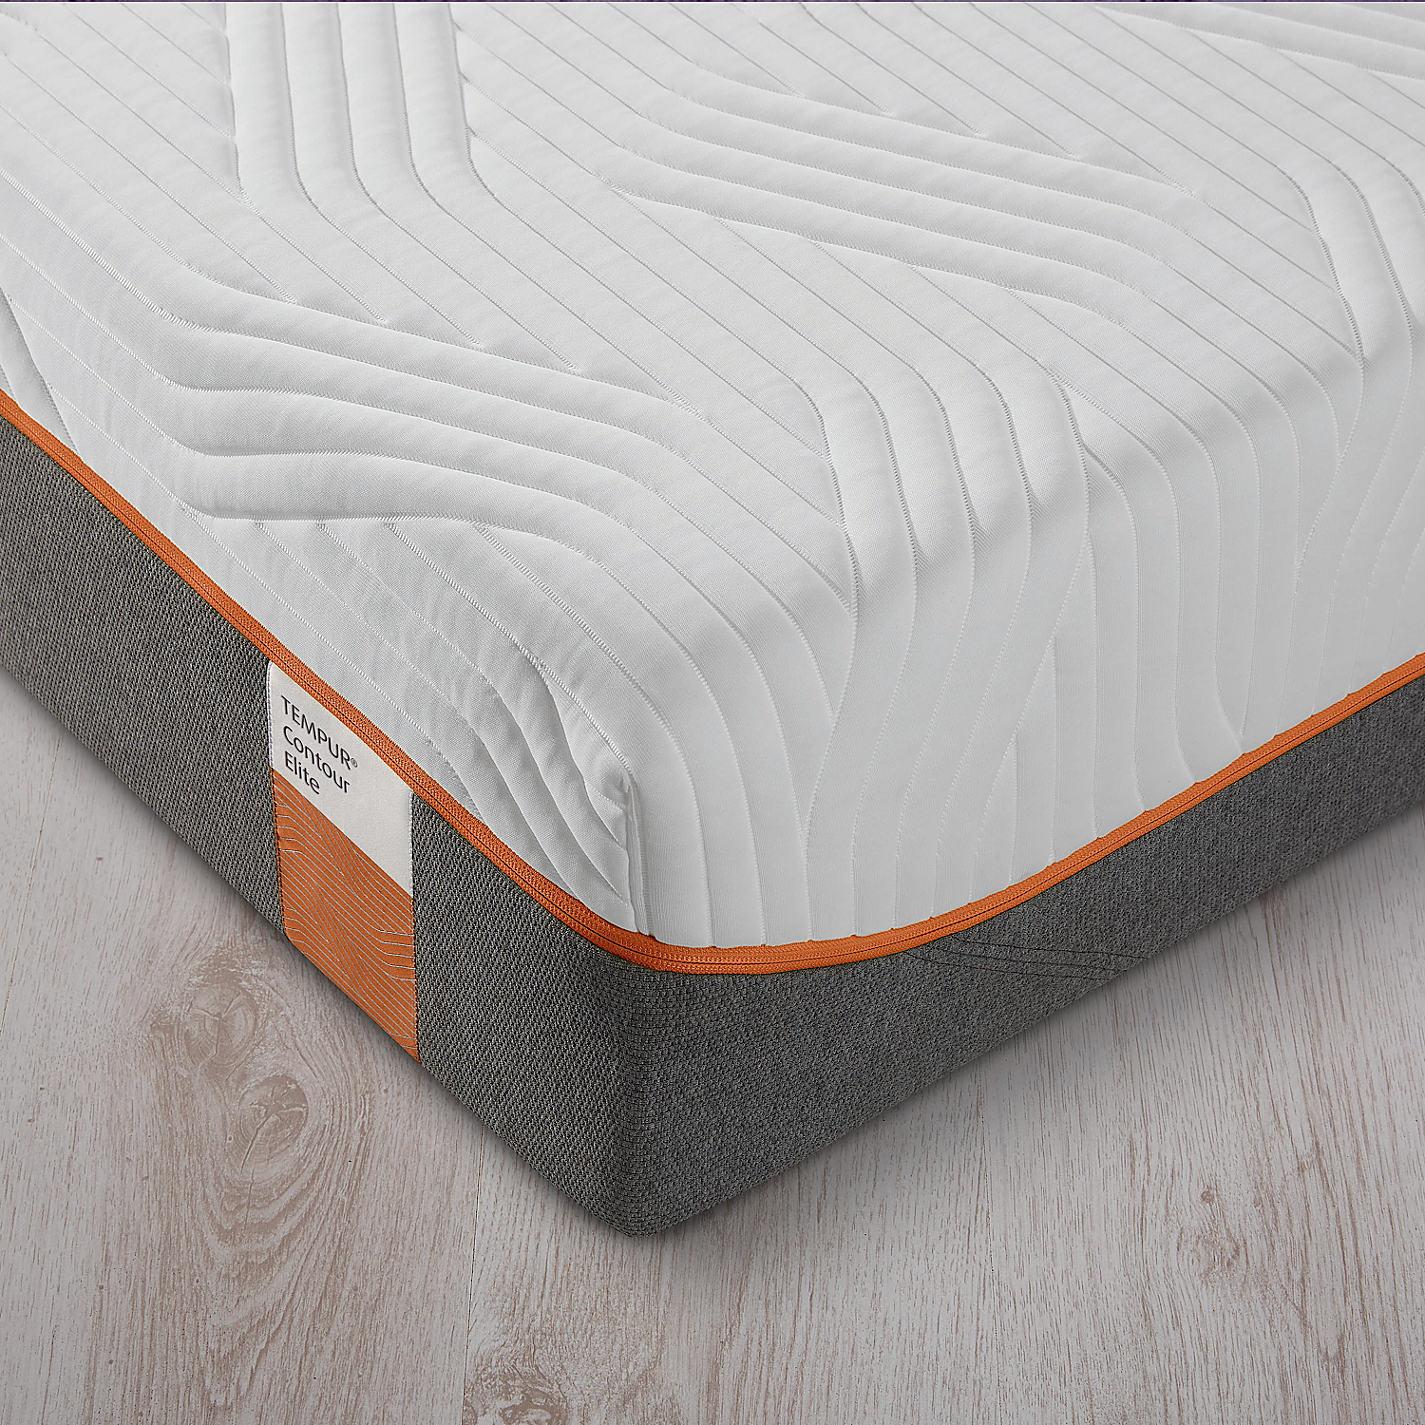 Tempur Contour Elite 25 Memory Foam Mattress Firm King Size Online At Johnlewis